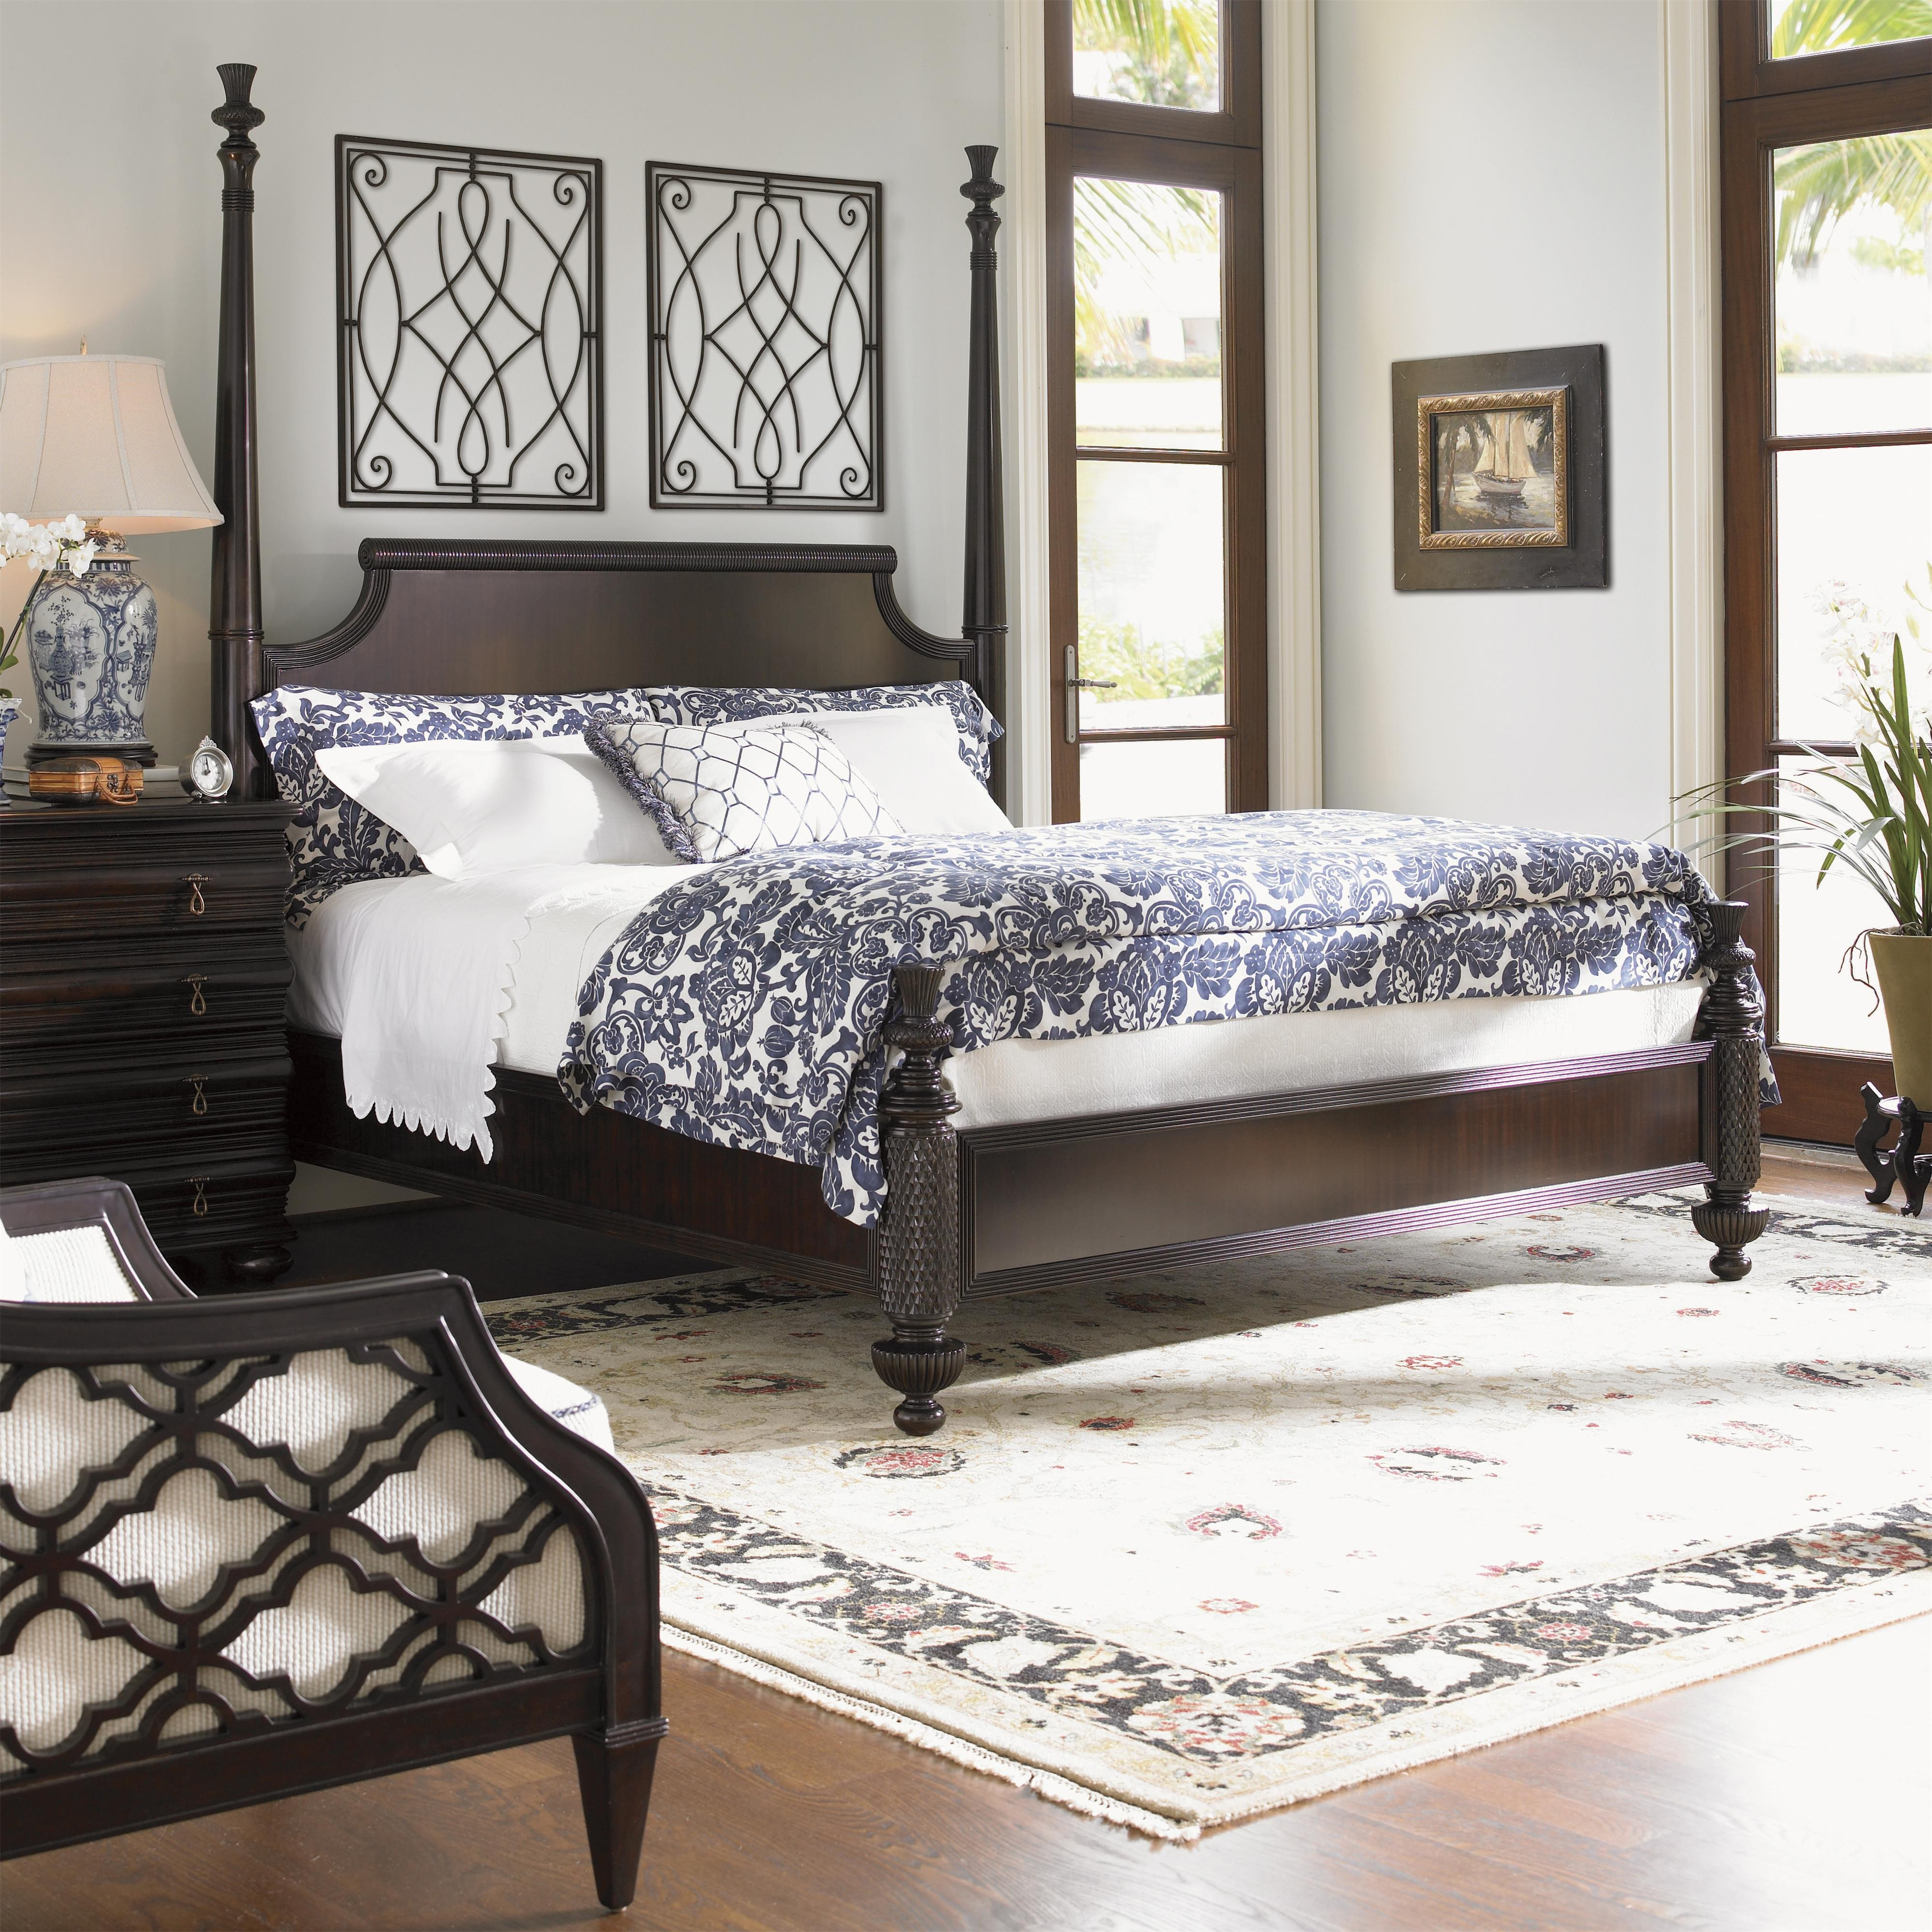 Tommy Bahama Bedroom Set New Royal Kahala Leather by tommy Bahama Home Hudson S